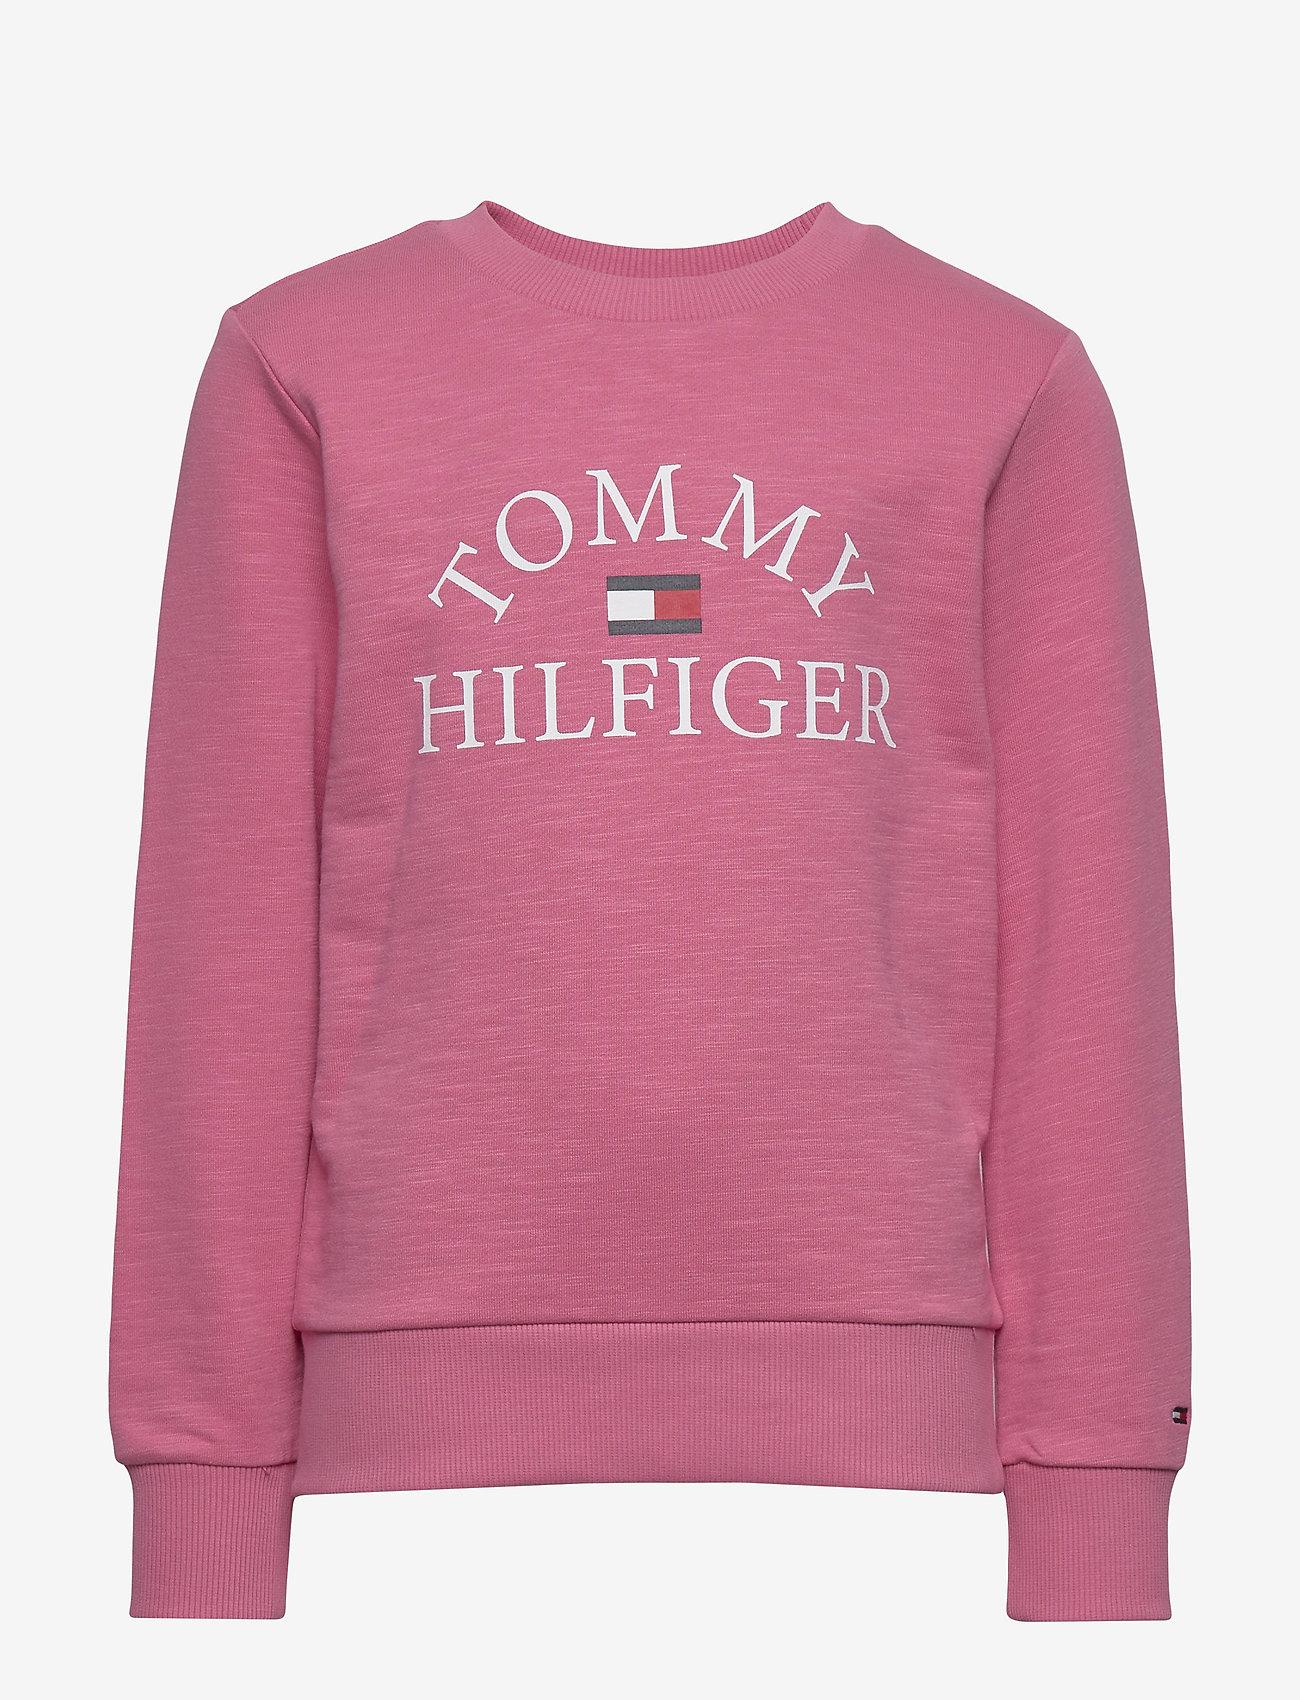 Tommy Hilfiger - ESSENTIAL LOGO SWEAT - sweatshirts - light cerise pink - 0